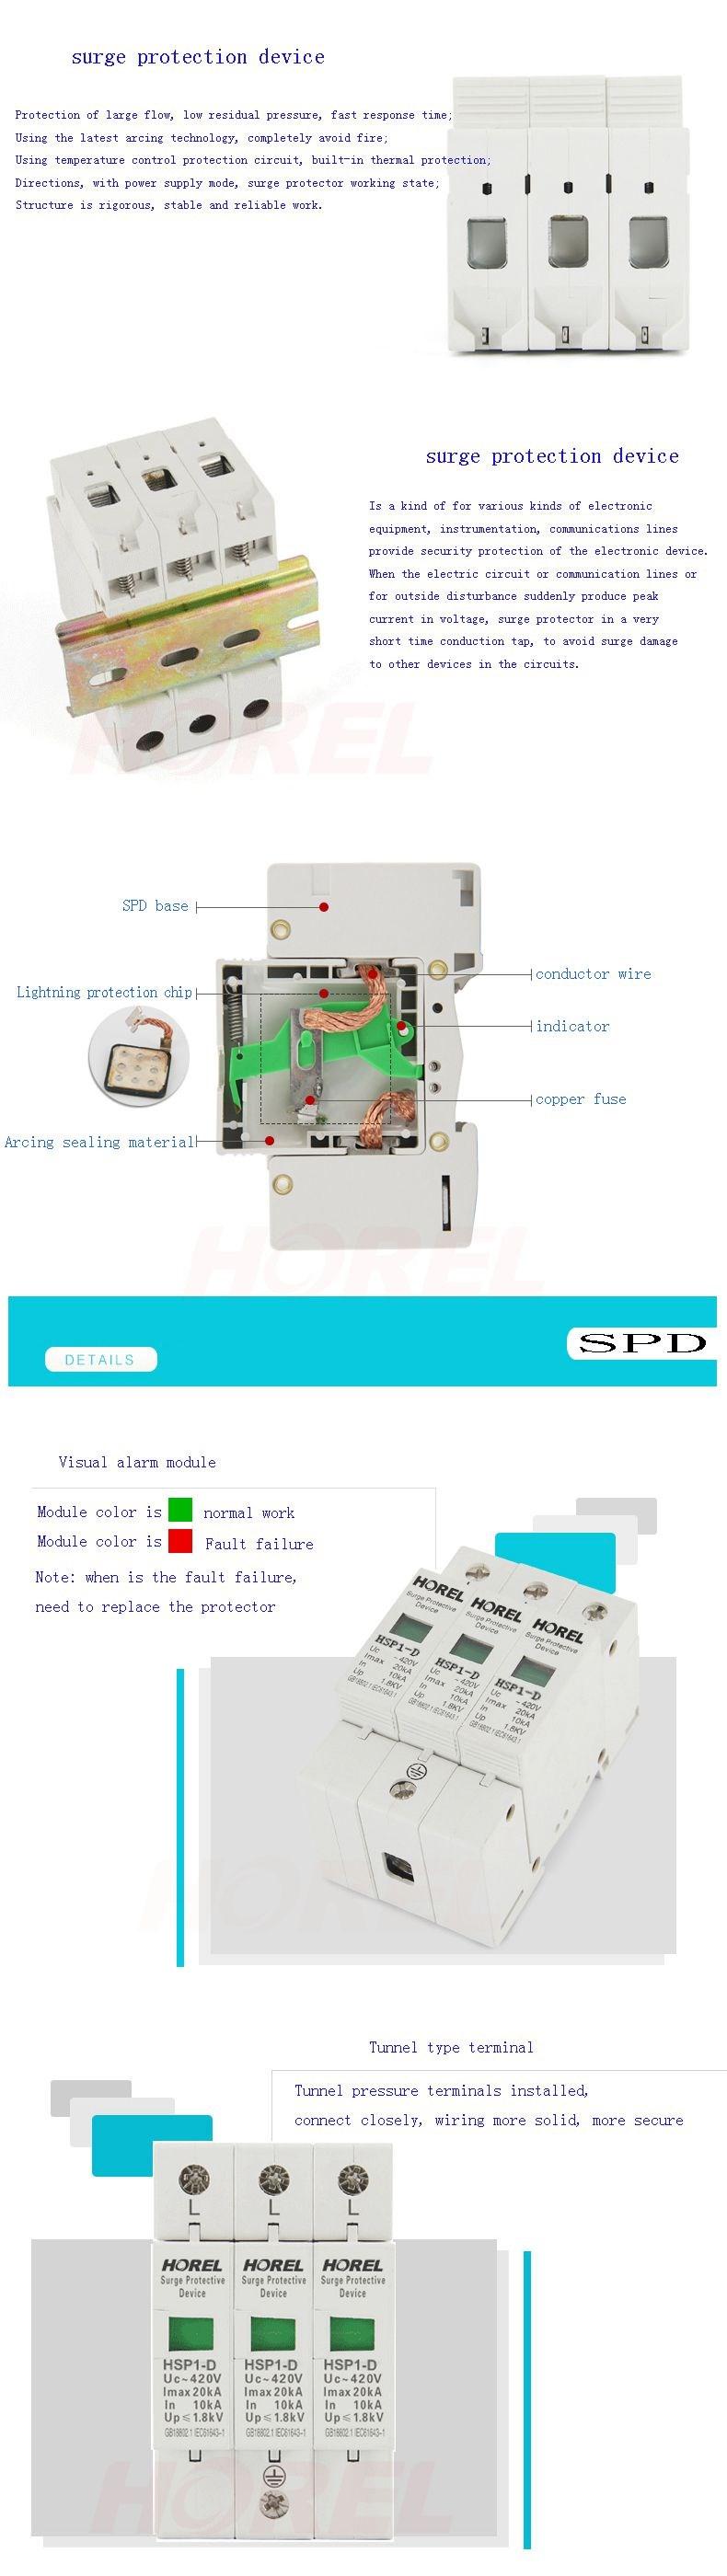 Ac Power Supply Surge Arrester Spd D 3 Pole 10ka 20ka 220v Protection Device Wiring Diagram Hsp1 Protector